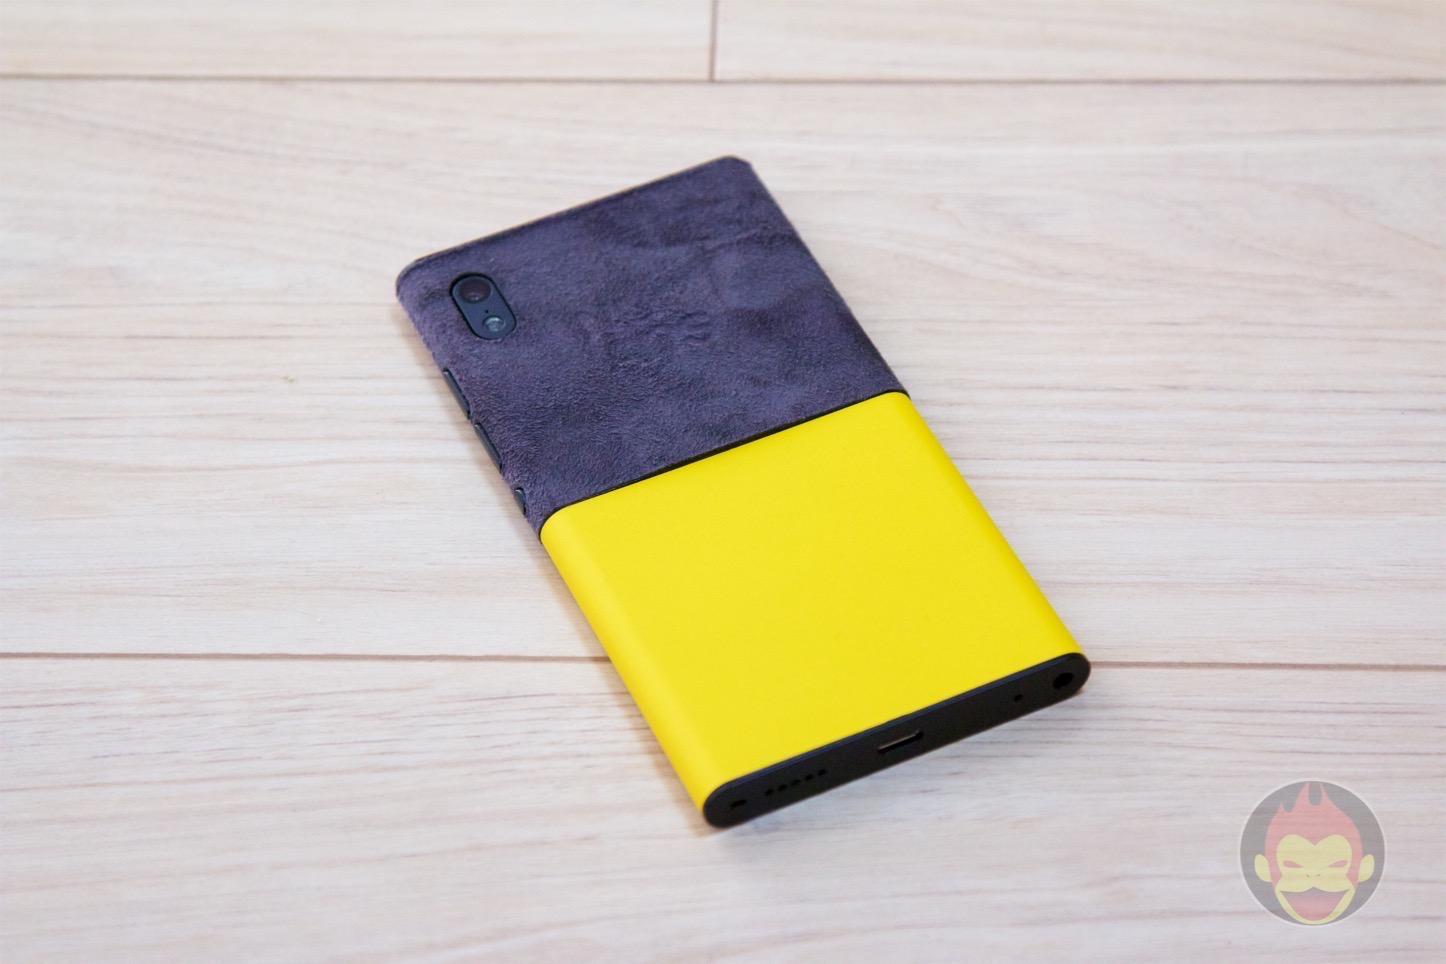 NuAns-Neo-Windows-10-Smartphone-02.jpg